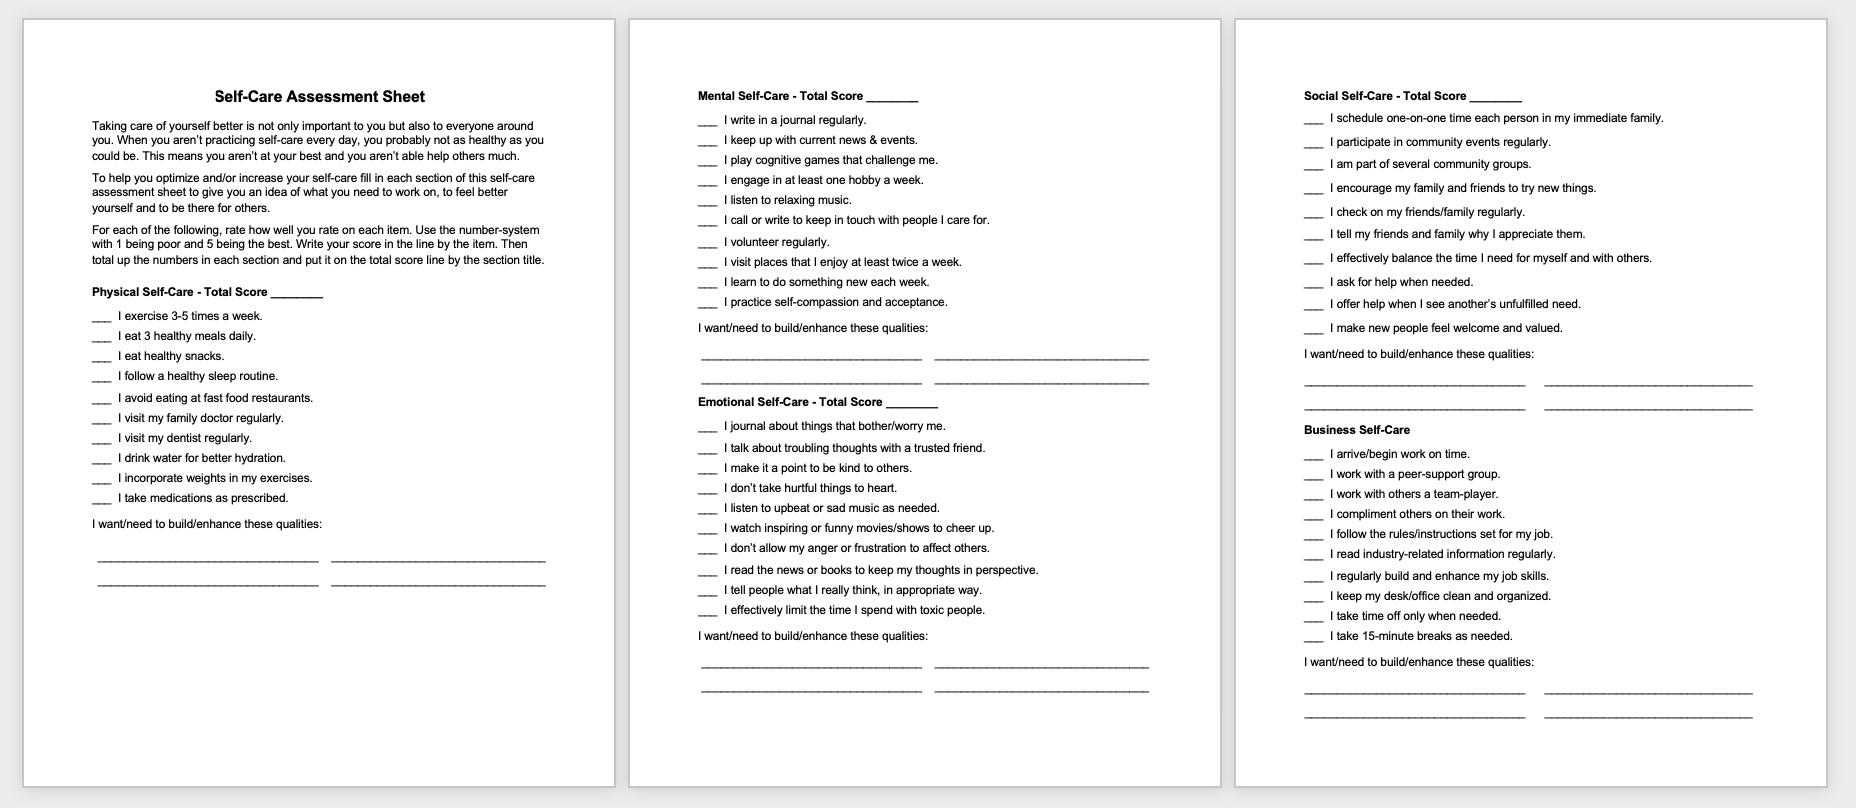 Free Self-Care Assessment Worksheet